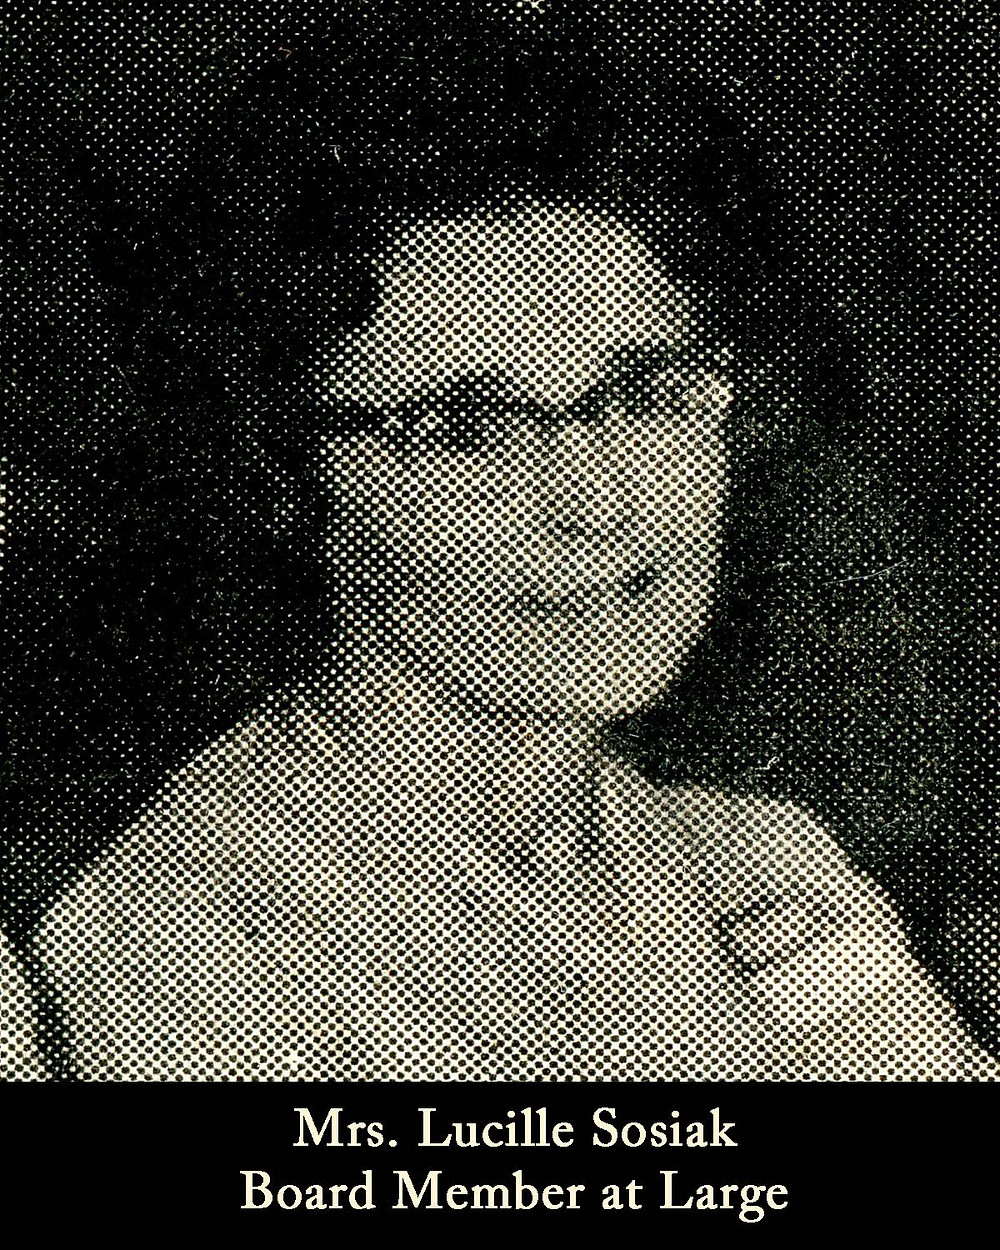 Lucille Sosiak